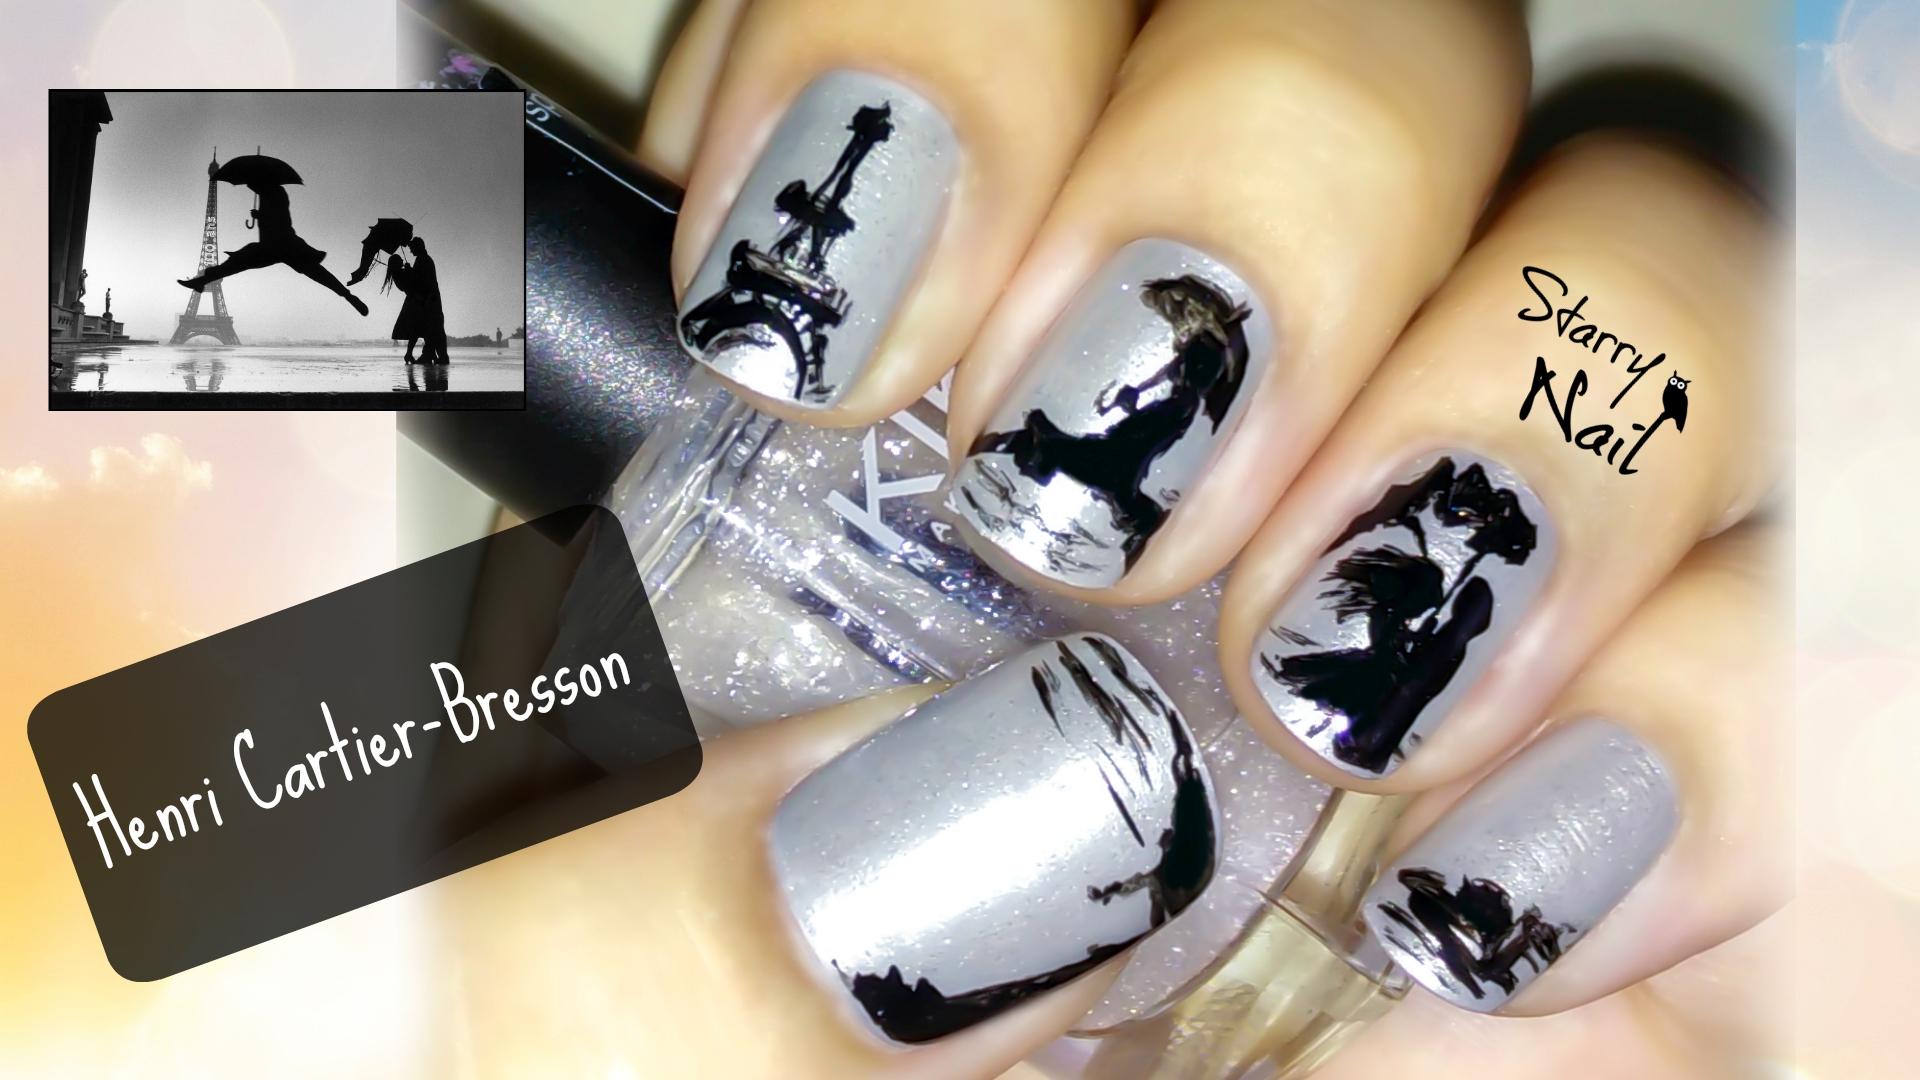 Henri cartier bresson nail art starrynail 2 august 2015 1920 1080 henri cartier bresson nail art prinsesfo Choice Image